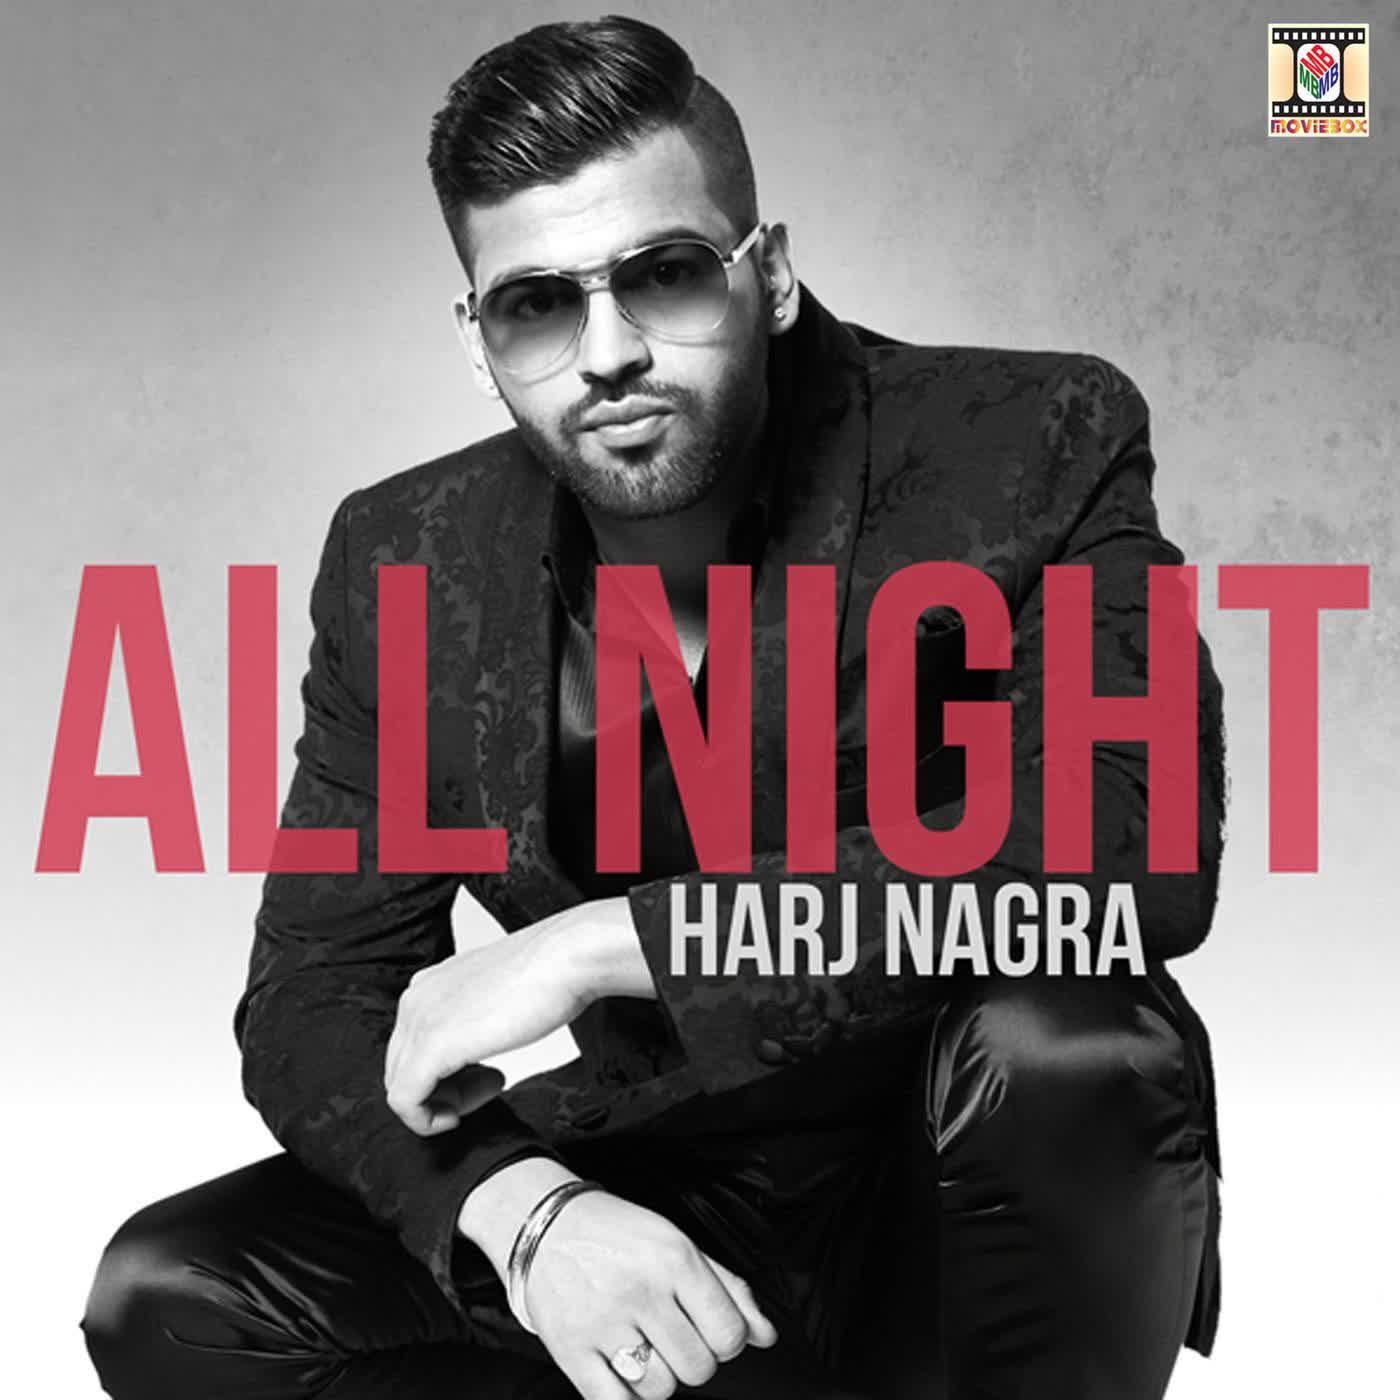 https://cover.djpunjab.org/36534/300x250/All_Night_Harj_Nagra.jpg